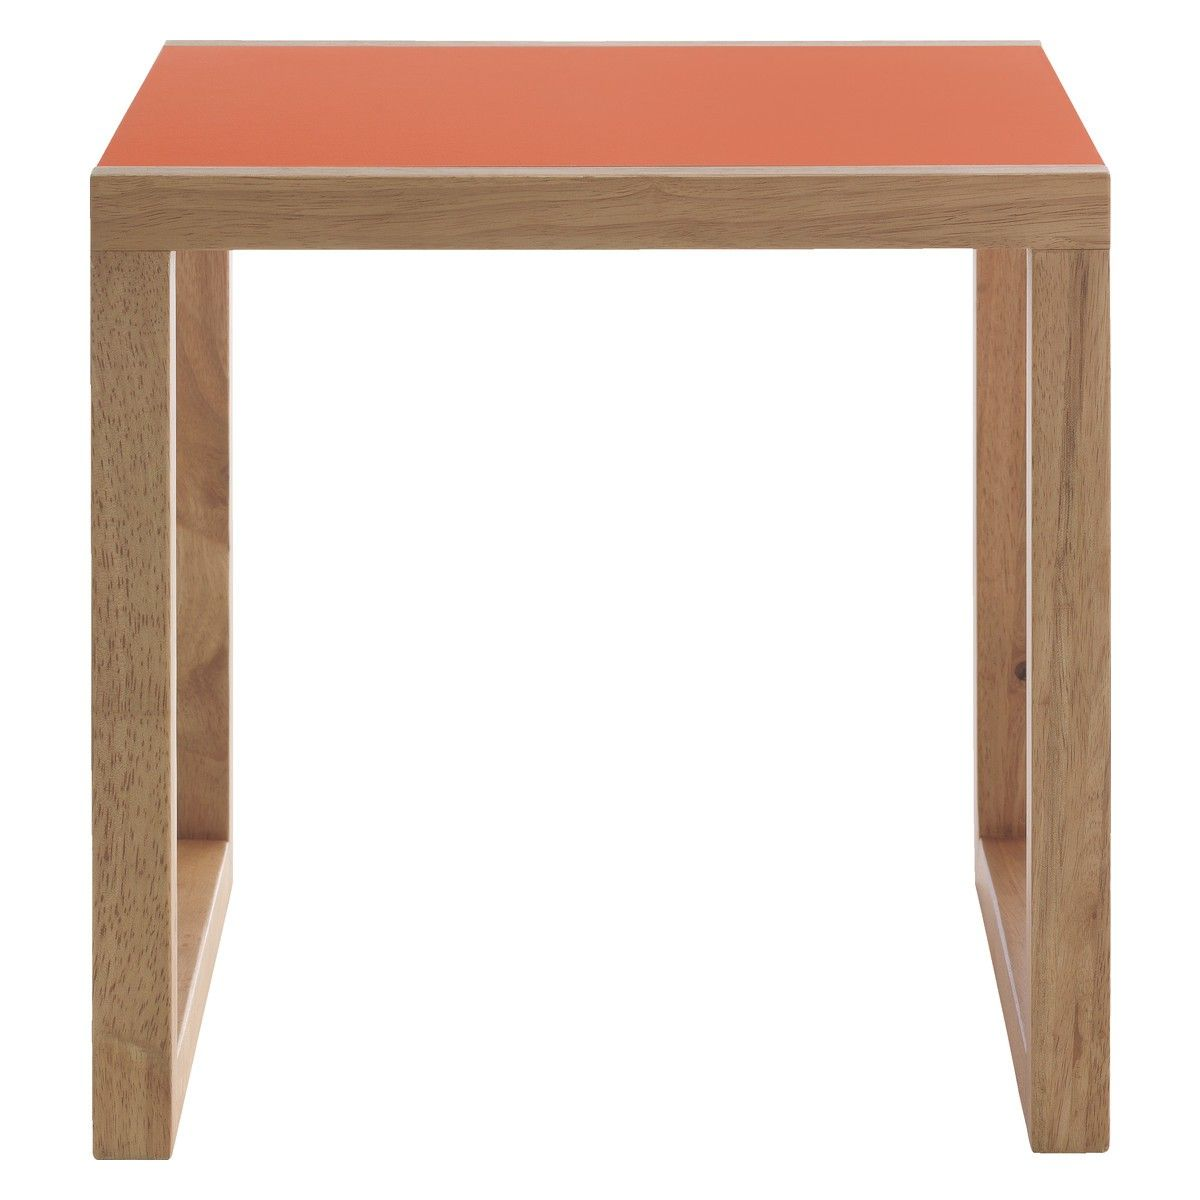 kenstal oak and orange side table  side table  pinterest  - kenstal oak and orange side table